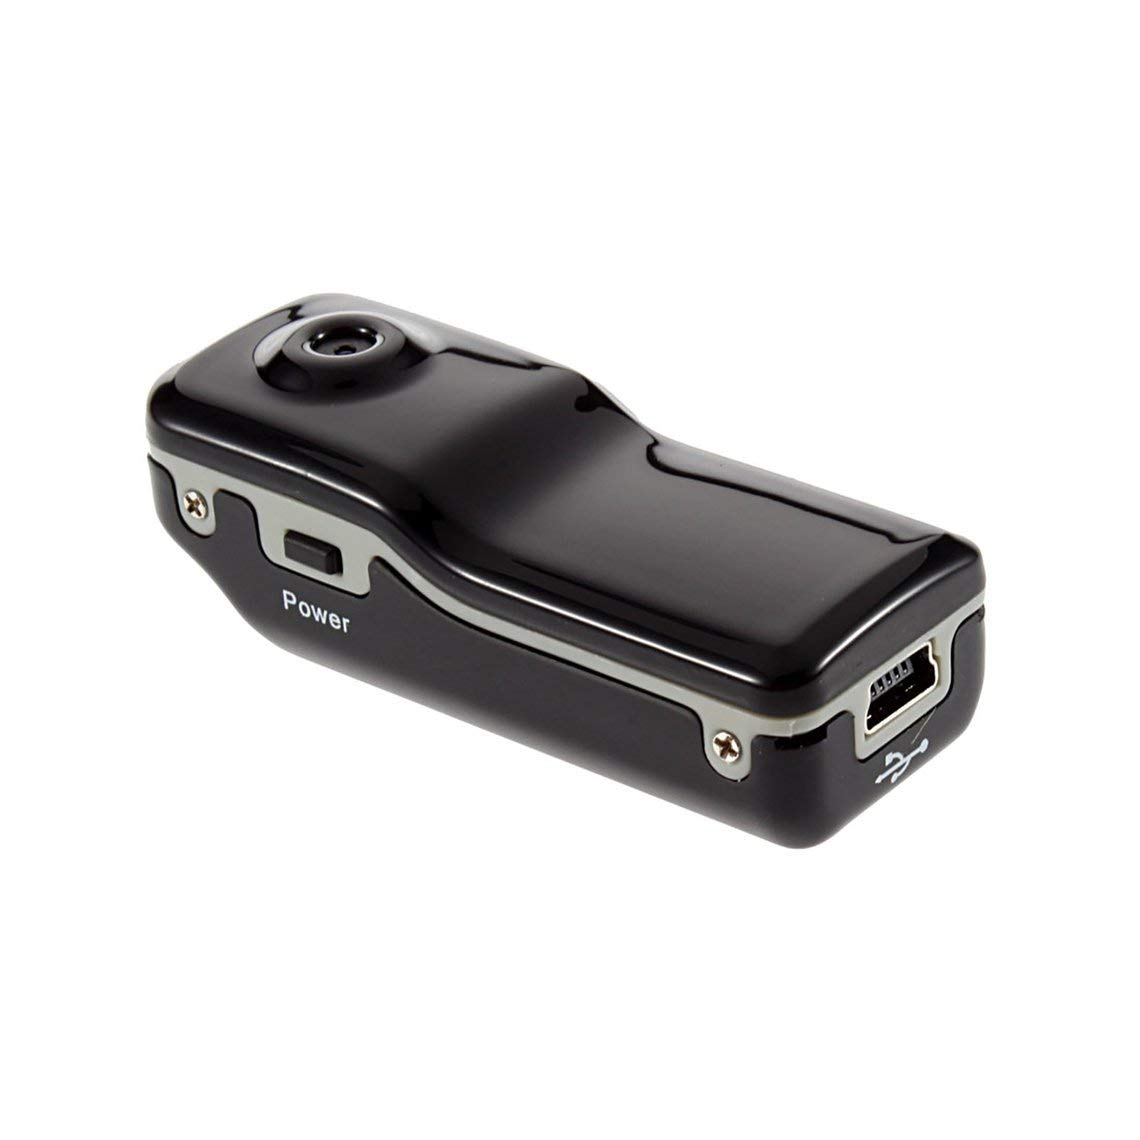 Zinniaya MD80 Mini videoc/ámara Compatible con c/ámara de Red Mini DV c/ámara de grabaci/ón Compatible con Tarjeta 8G TF 720 480 Vedio c/ámara de grabaci/ón